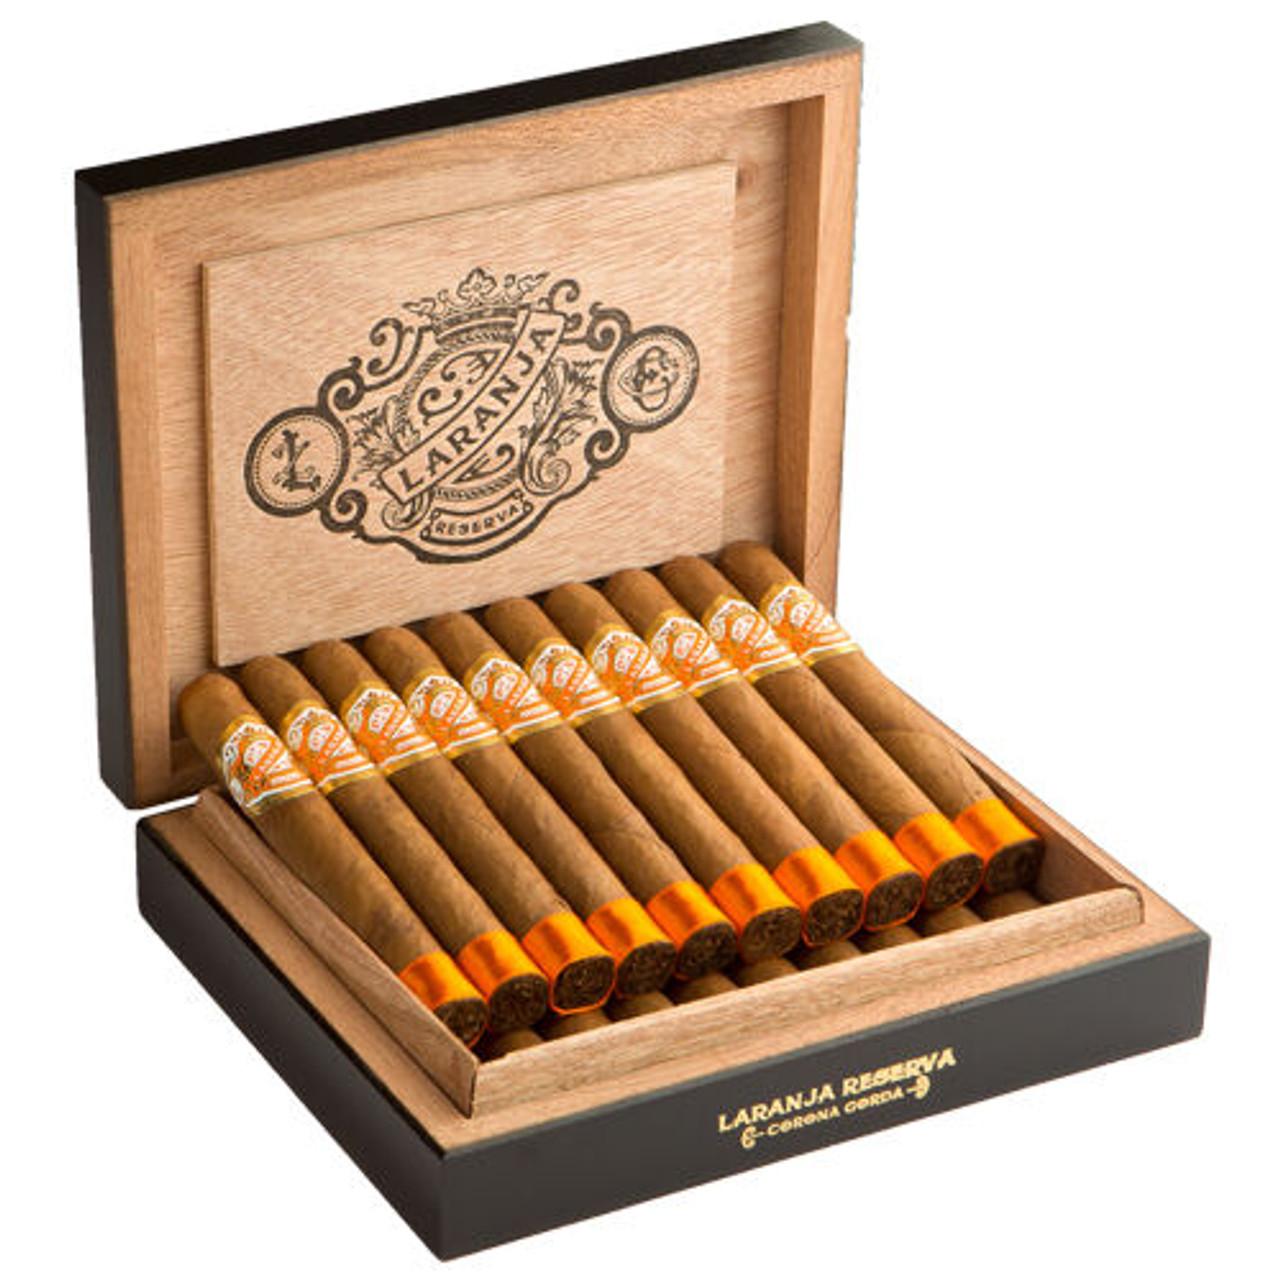 Espinosa Laranja Reserva Toro Cigars - 6.0 x 52 (Cedar Chest of 20)